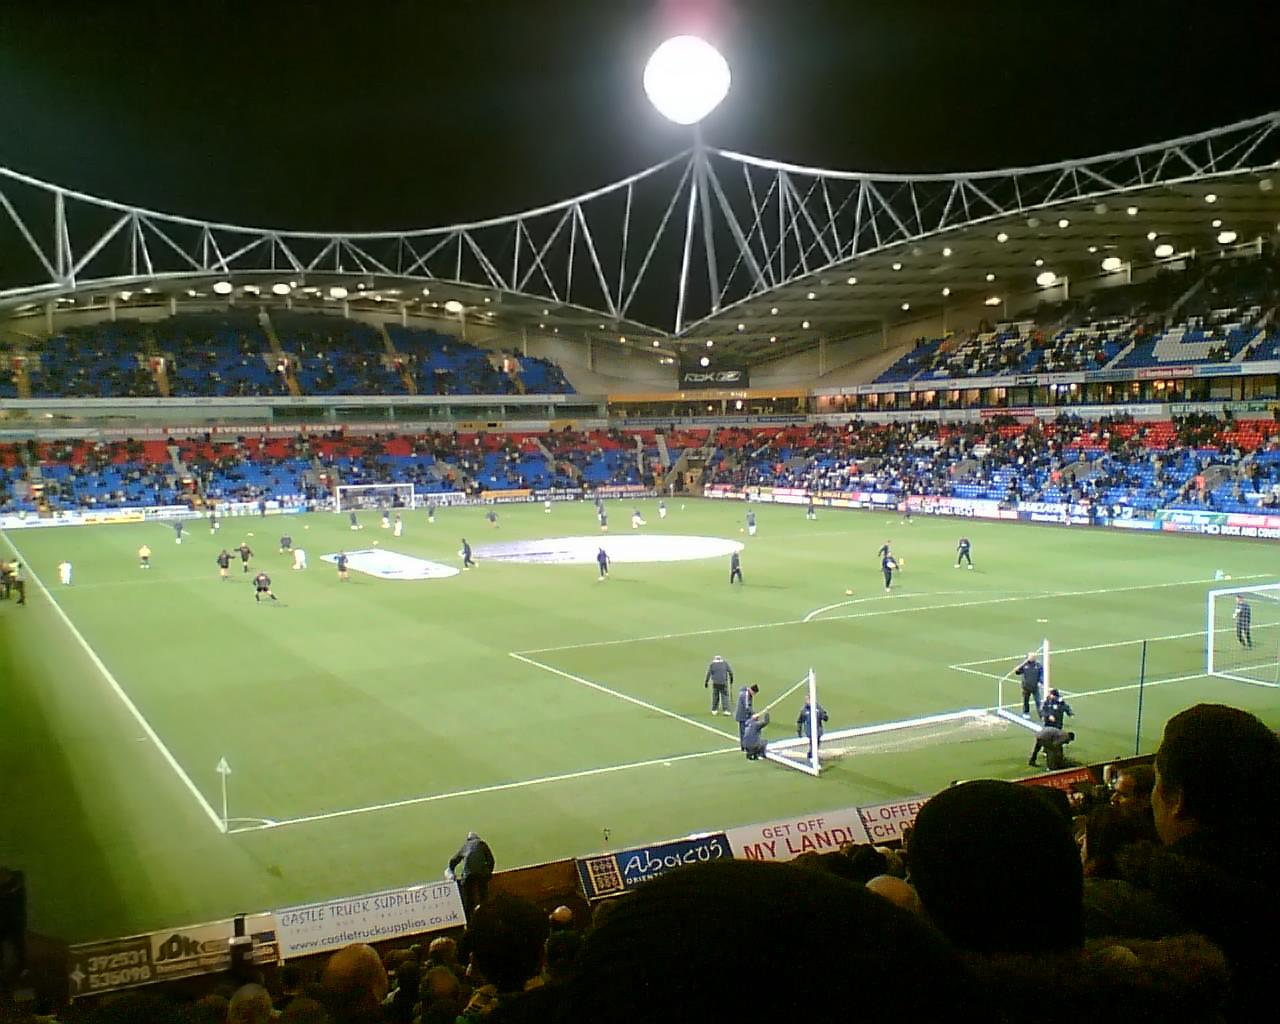 https://i0.wp.com/upload.wikimedia.org/wikipedia/commons/1/11/Reebok_Stadium.jpg